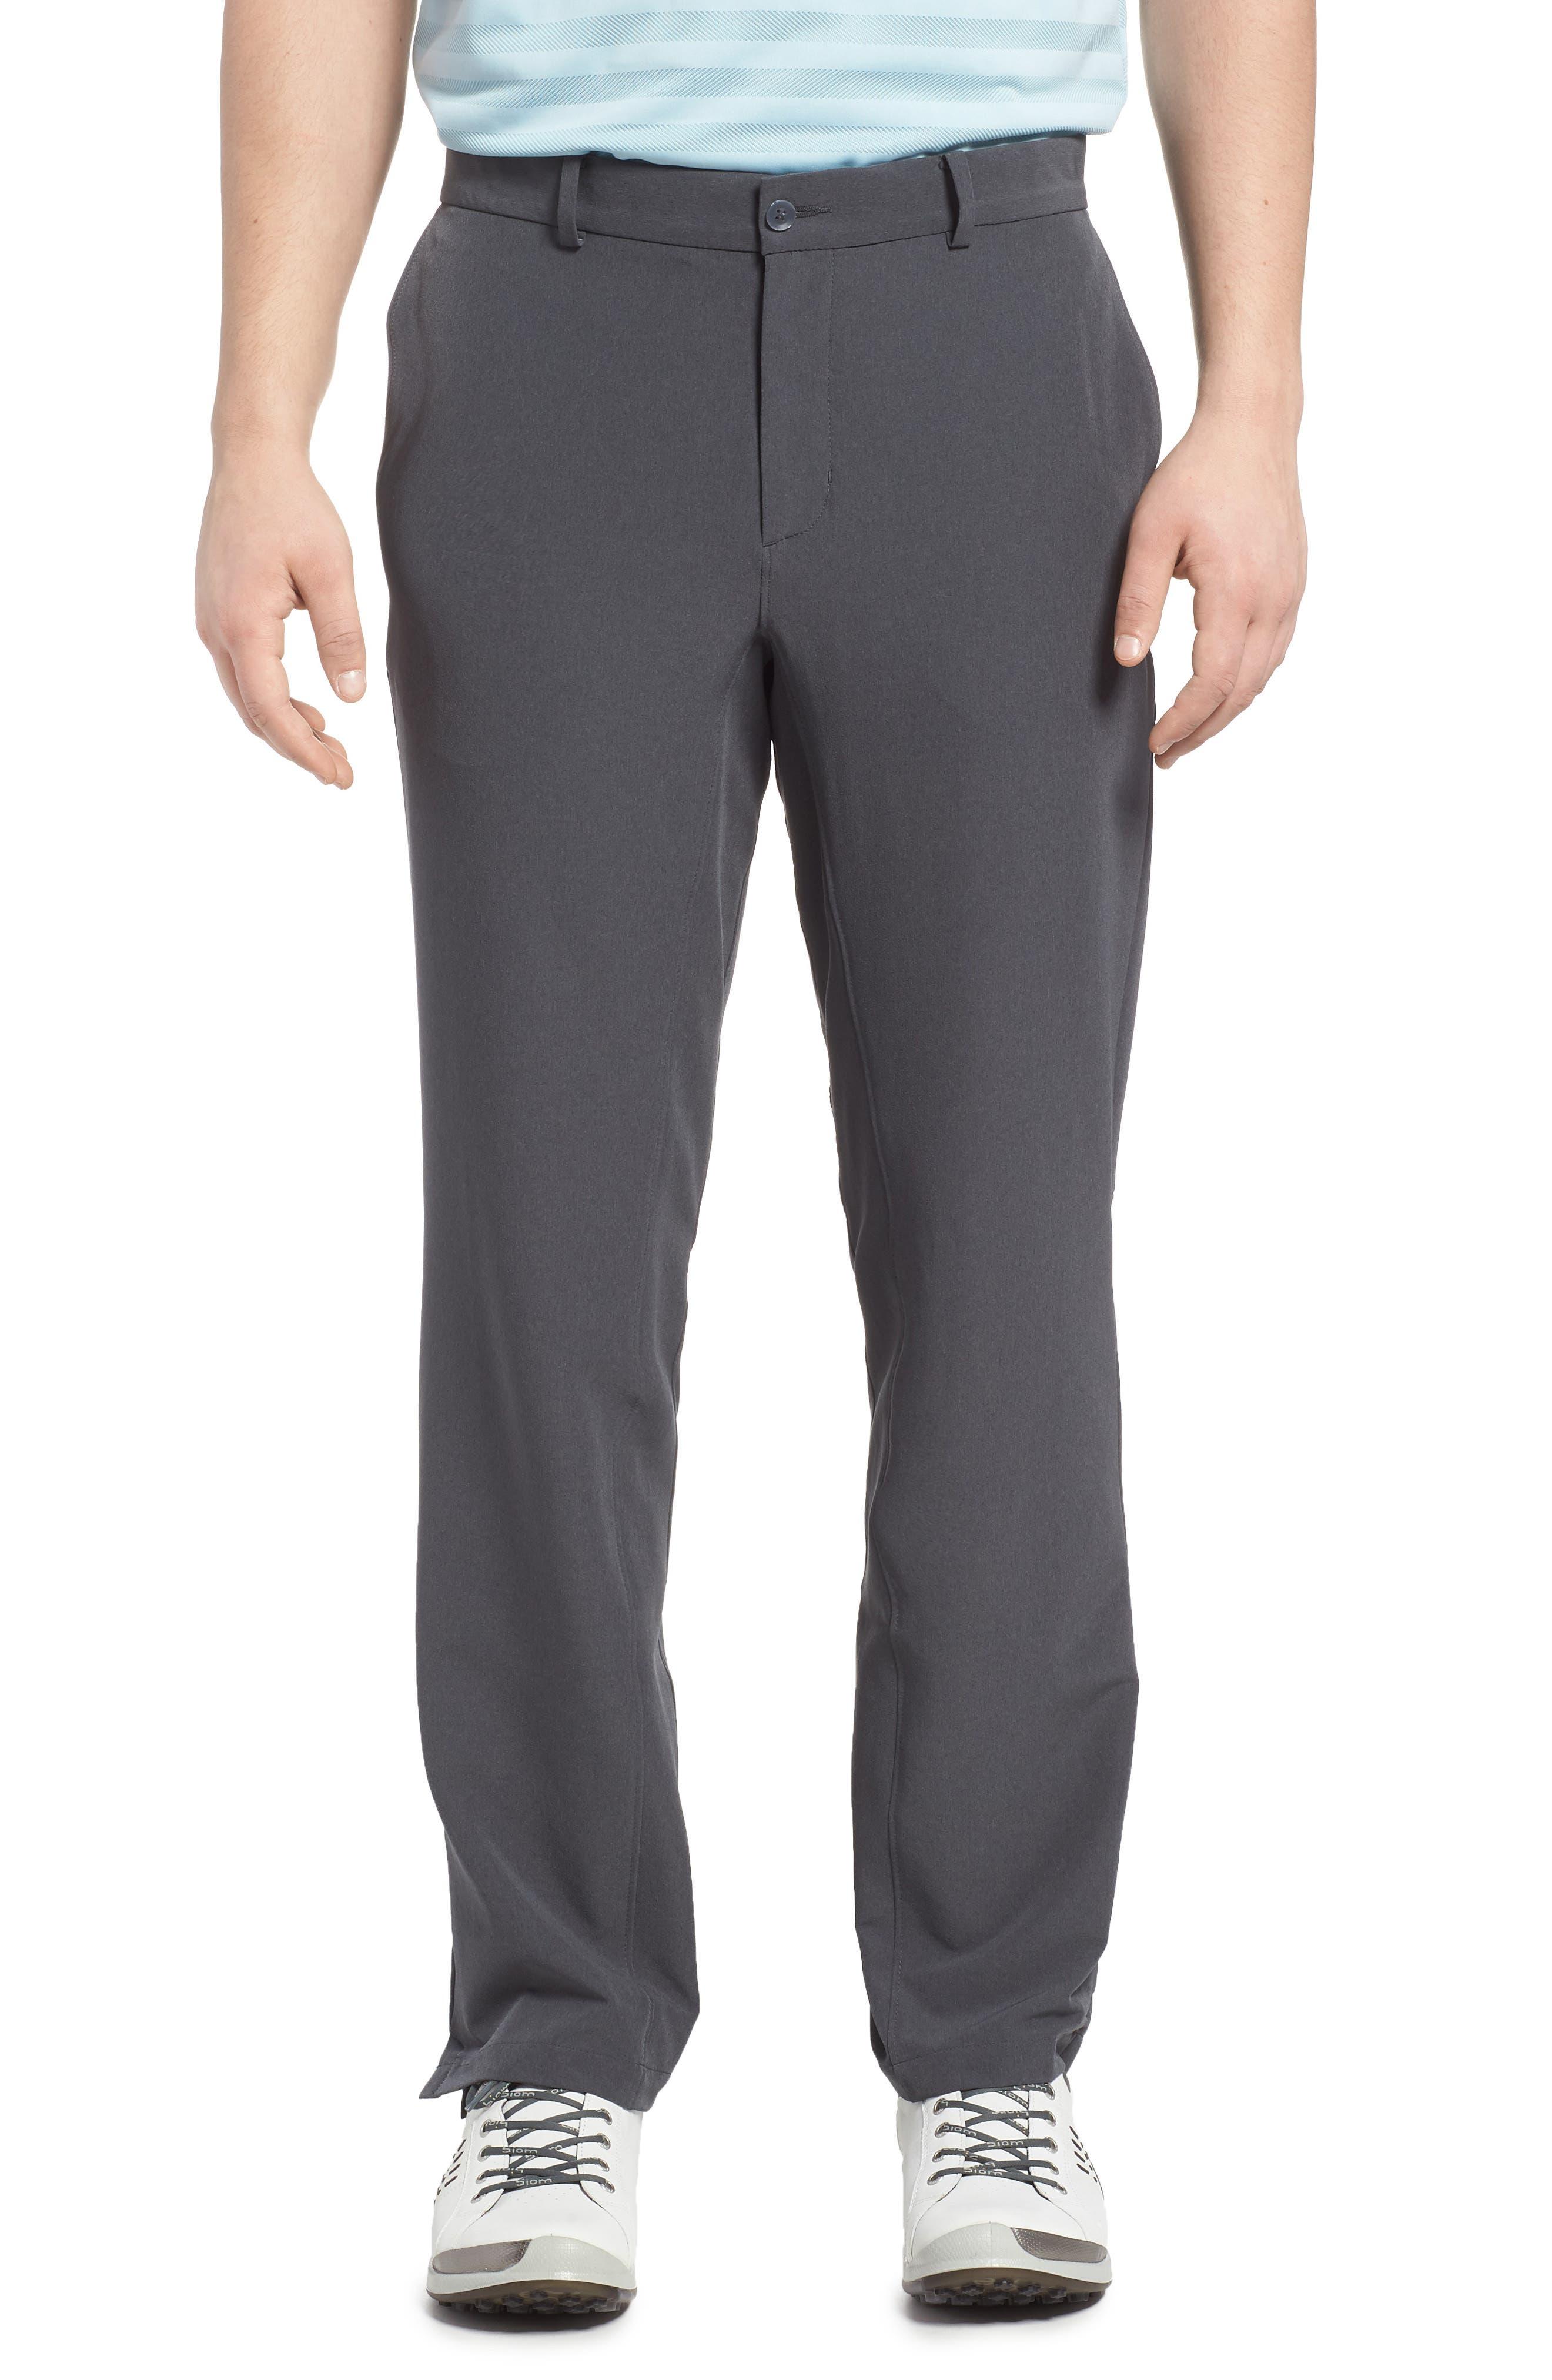 Hybrid Flex Golf Pants,                             Main thumbnail 1, color,                             CHARCOAL HEATHER/ DARK GREY